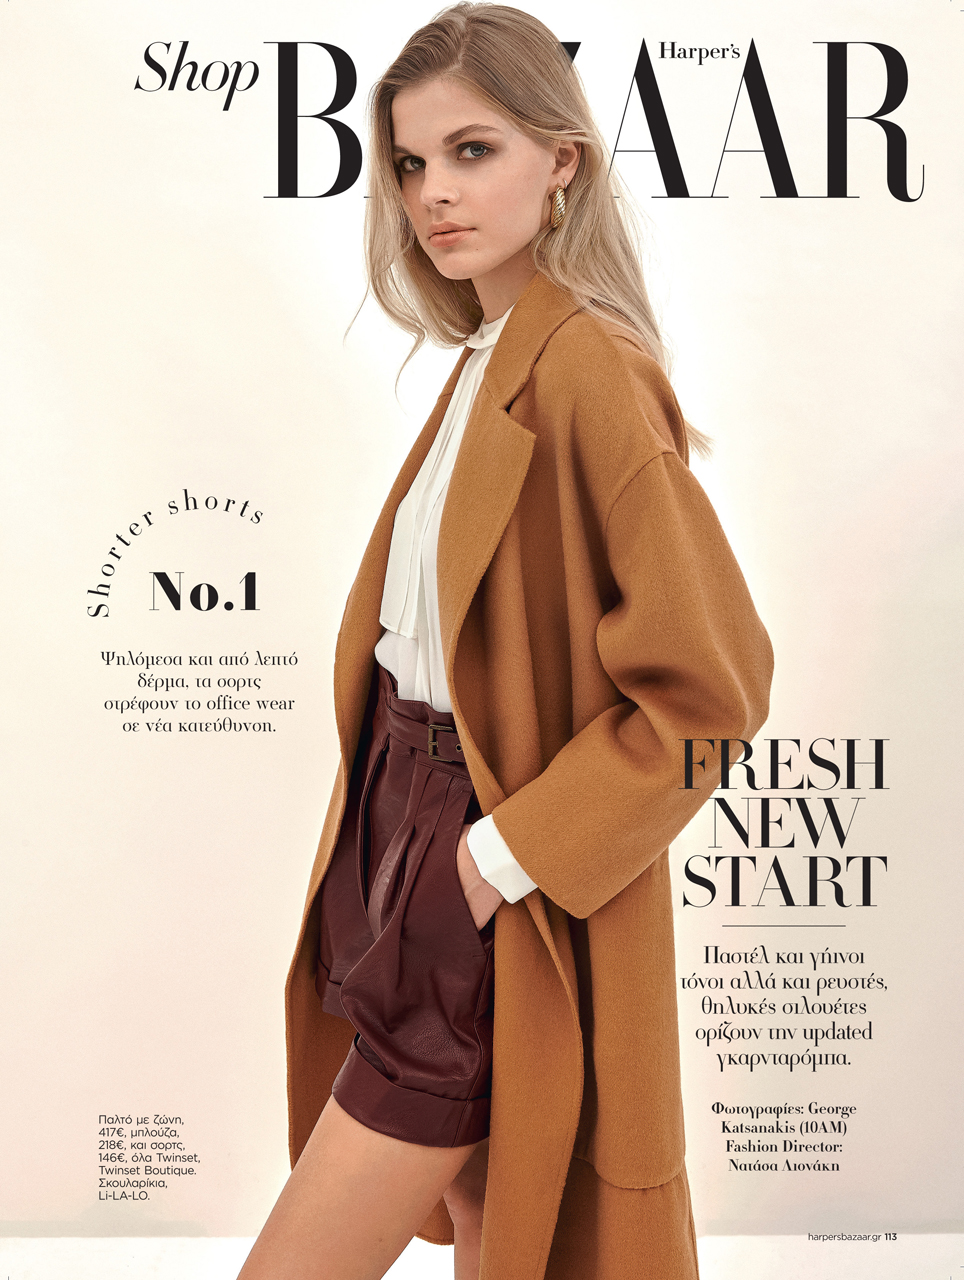 Dalma Baczay for Harper's Bazaar